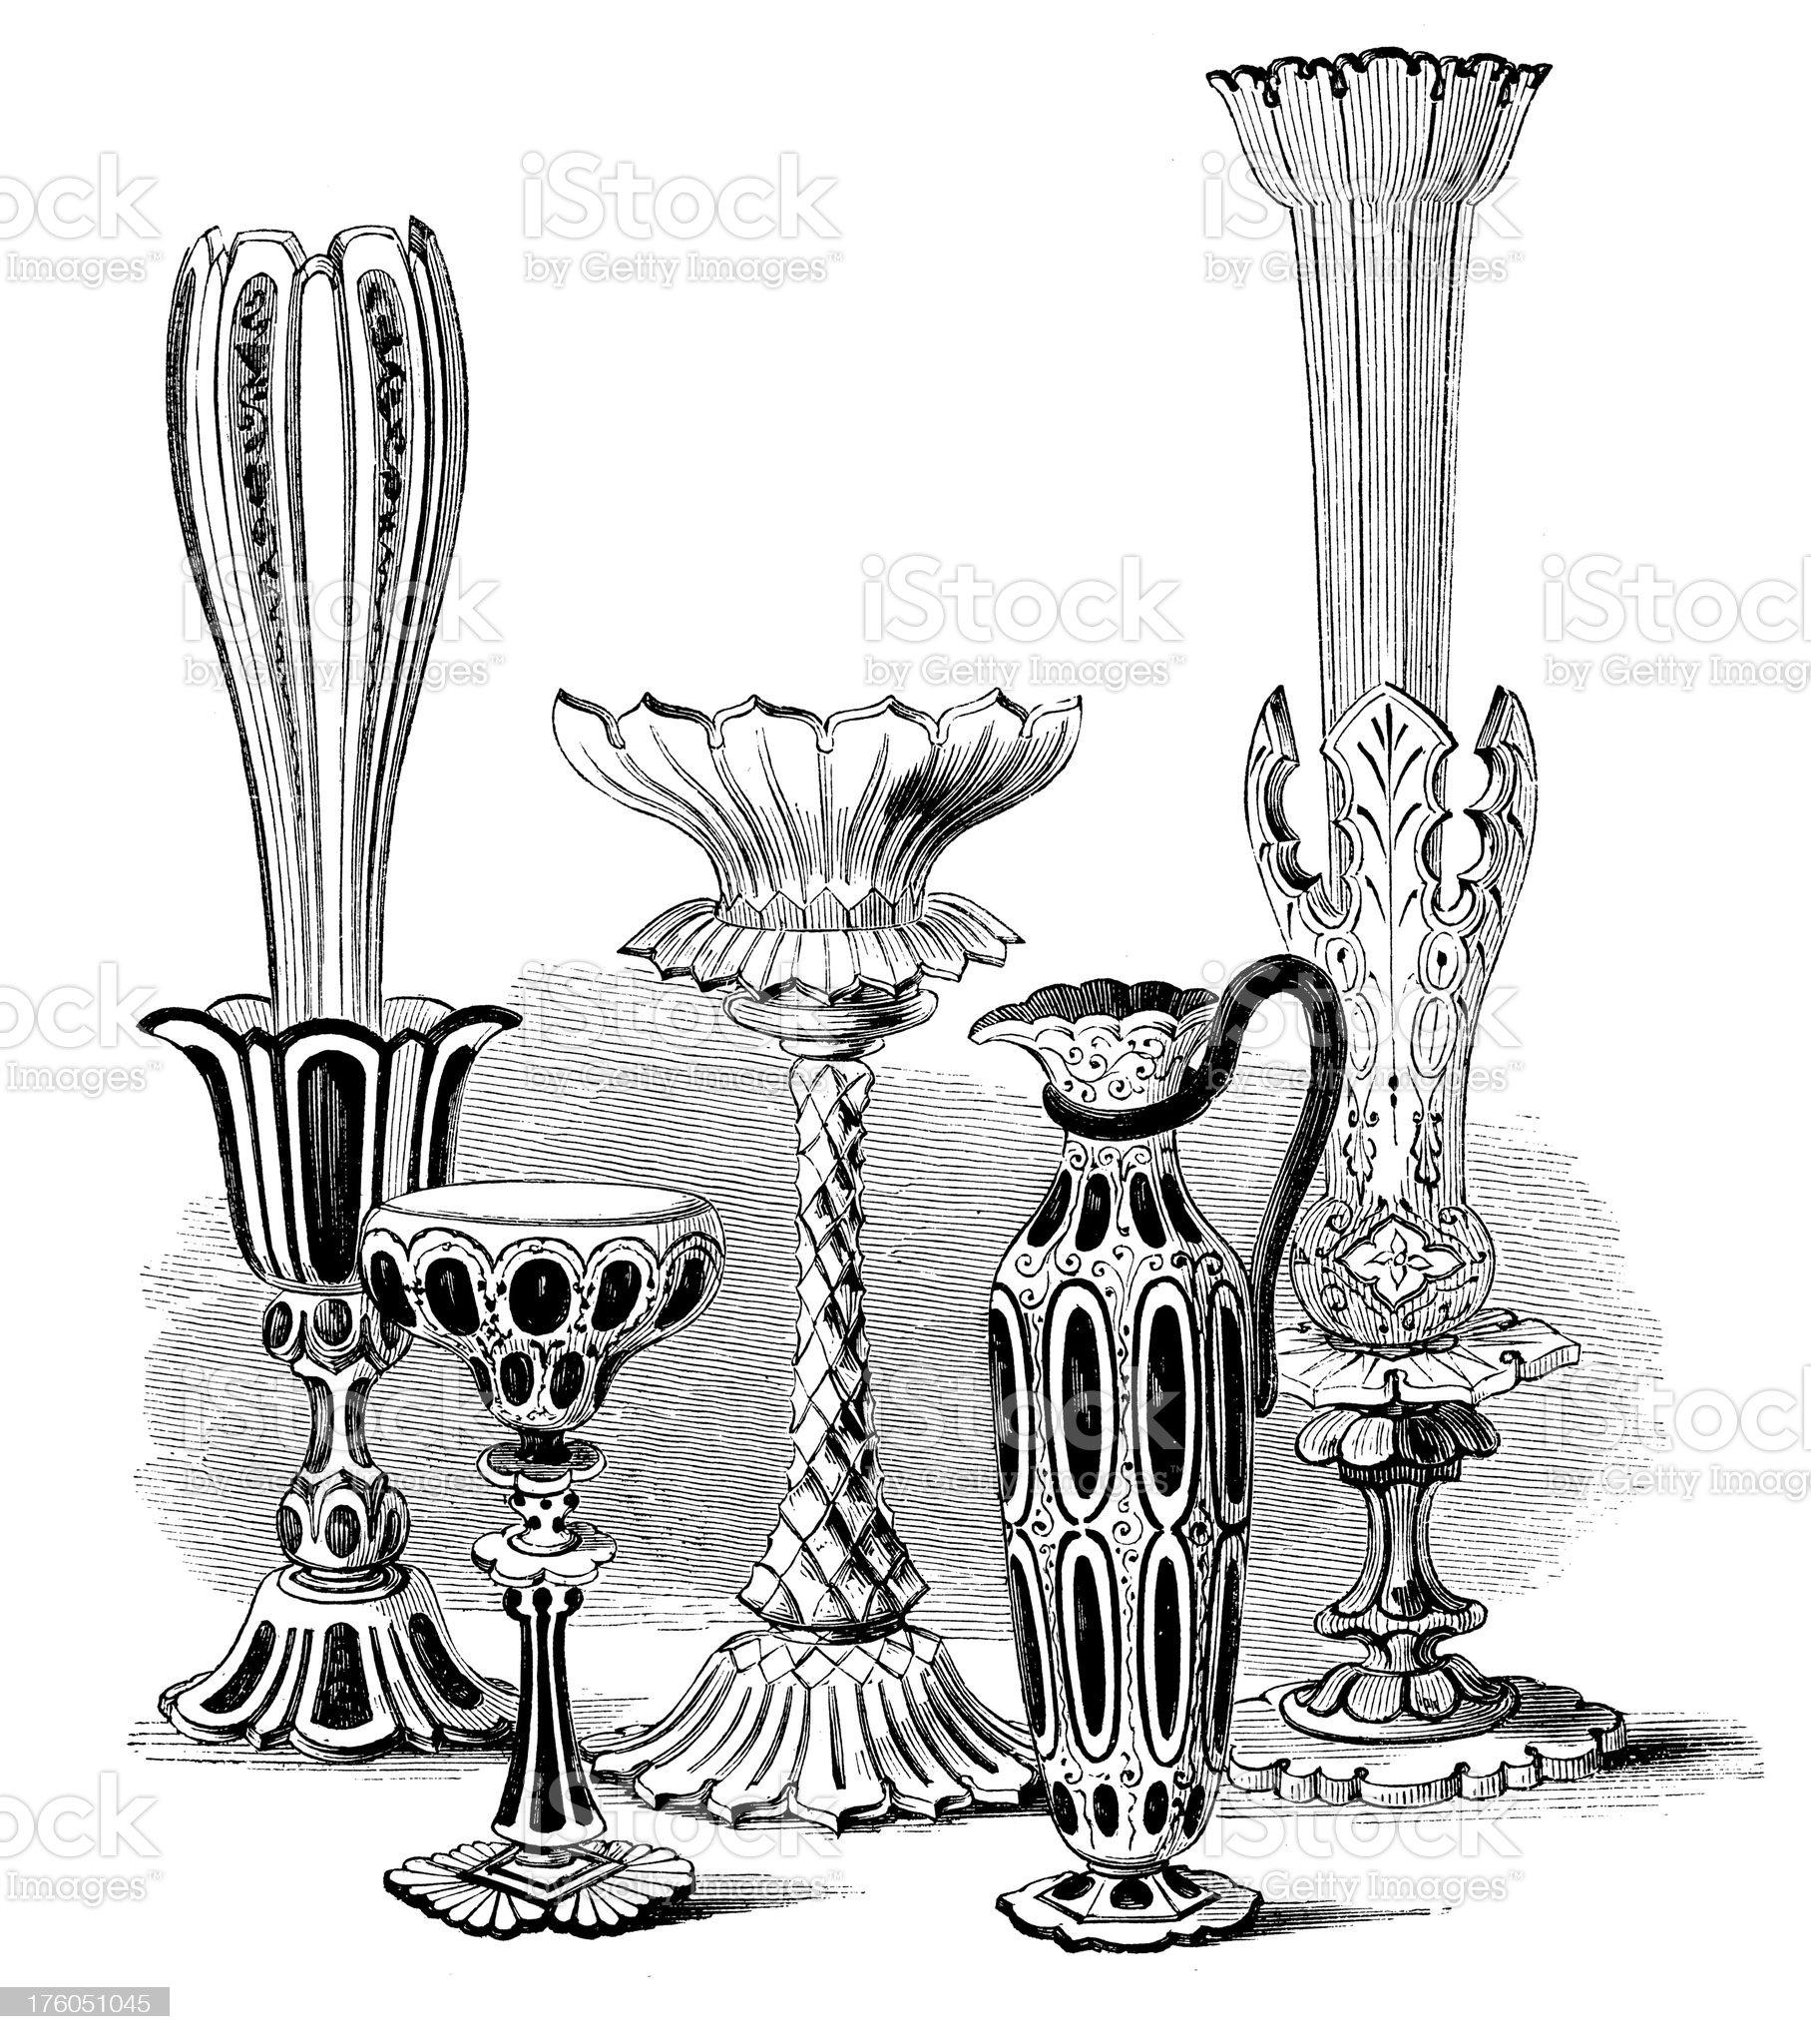 Set of Victorian Vases | Antique Design Illustrations royalty-free stock vector art